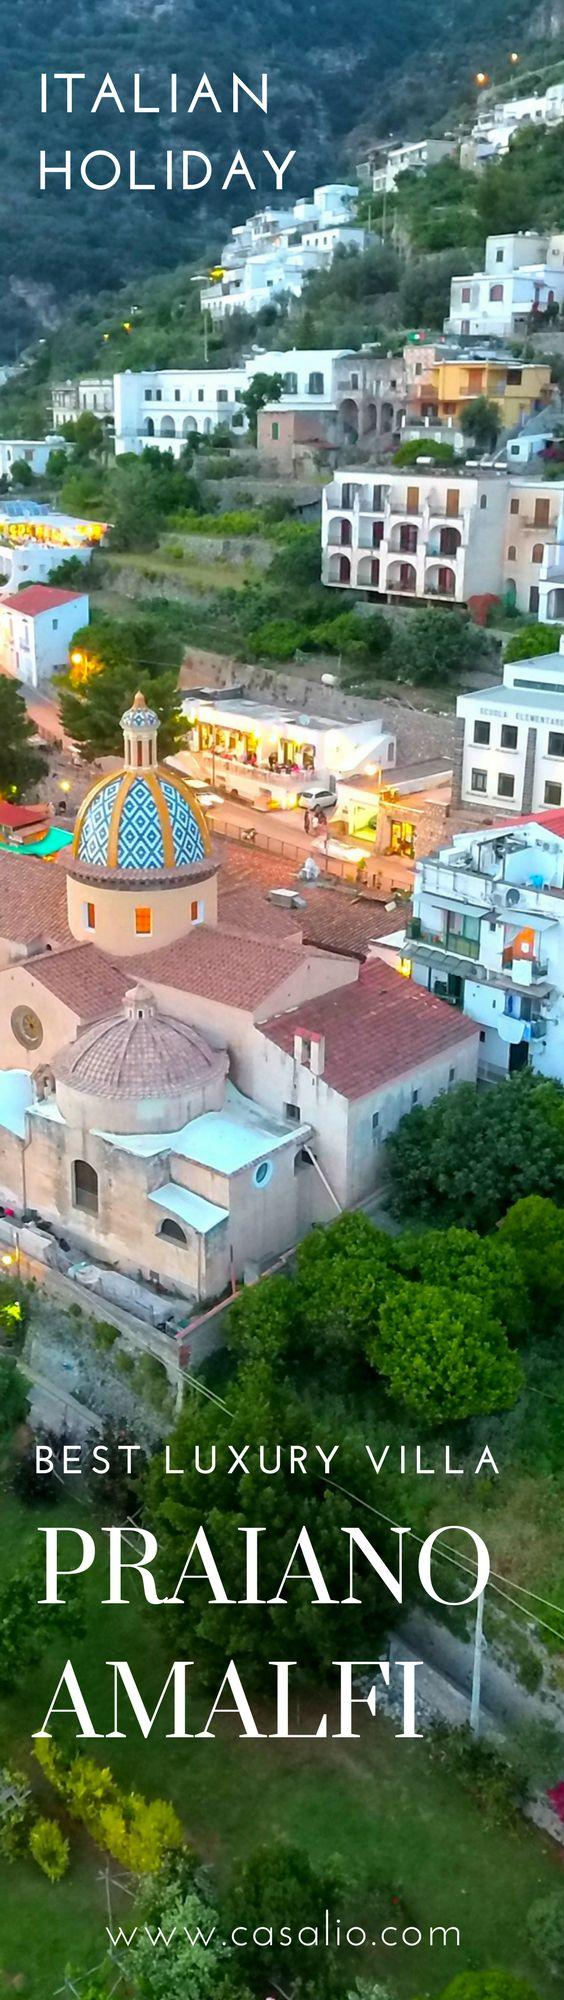 The best luxury holiday villa in Praiano, Amalfi. Masassette Luxury Villa in Casalio Travel. #amalfivillas #amalficoast #amalfiurlaub #italienurlaub #ferienwohnung #ferienhaus #ferienvilla